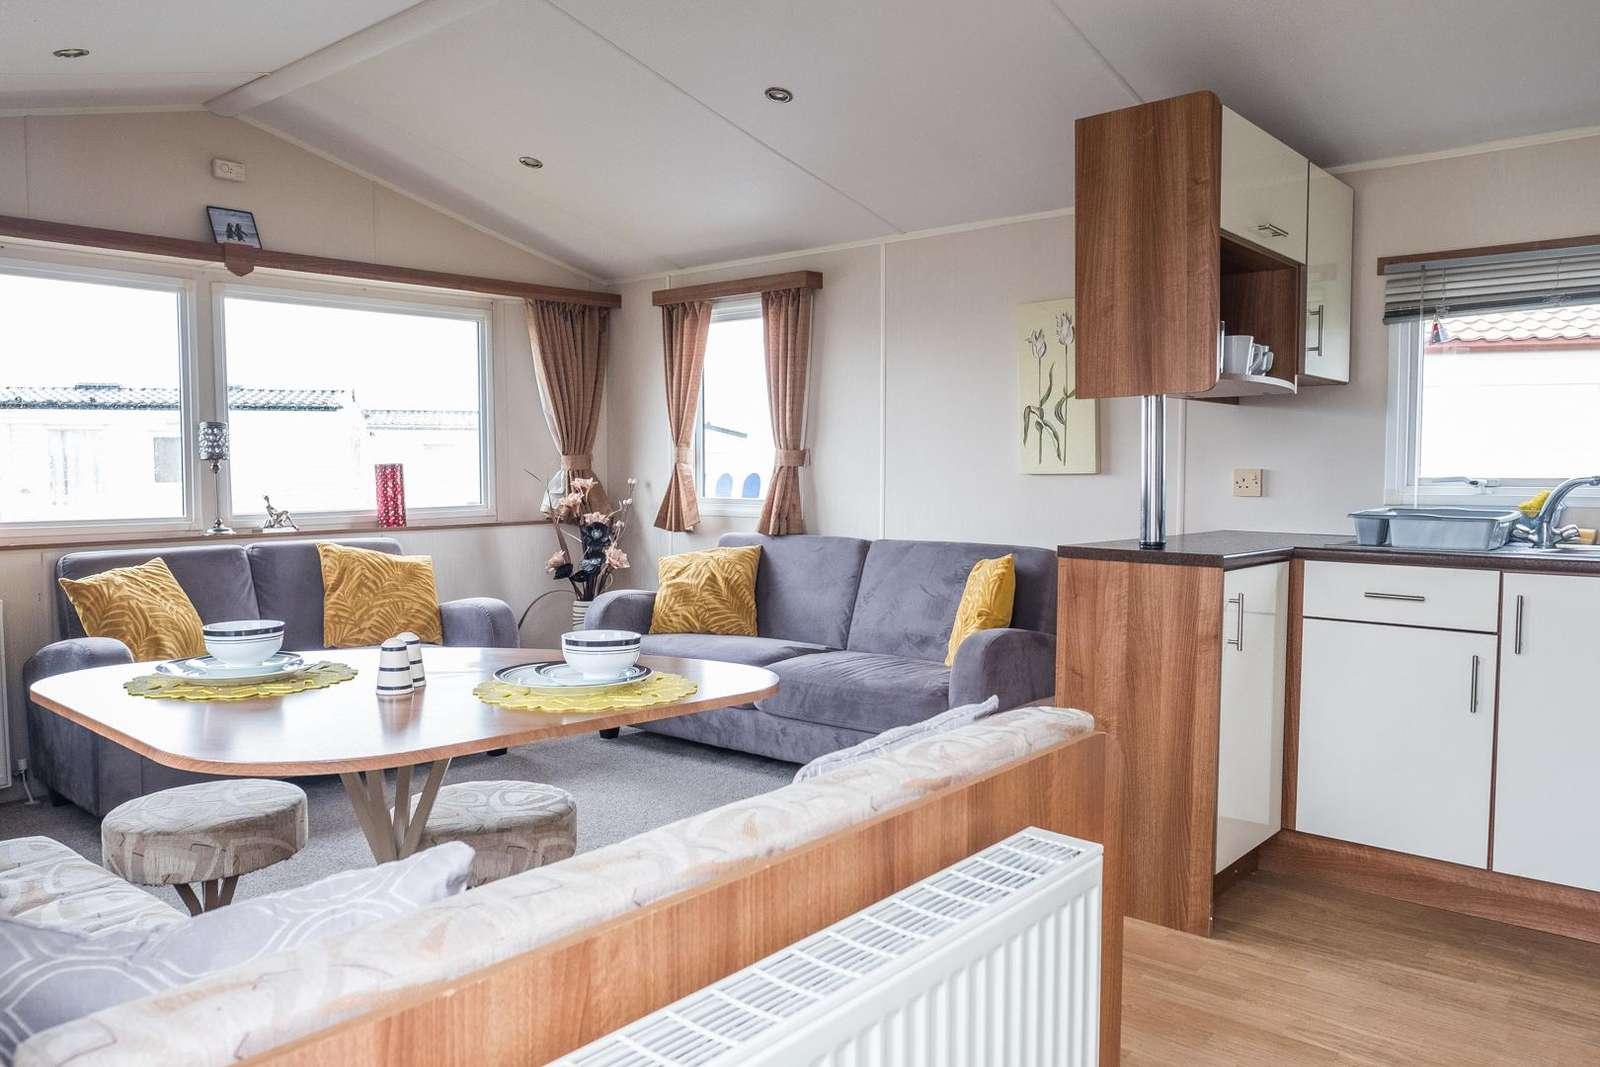 29005HV – Heron views, 2 bed, 4 berth caravan with D/G & C/H. Ruby rated. - property